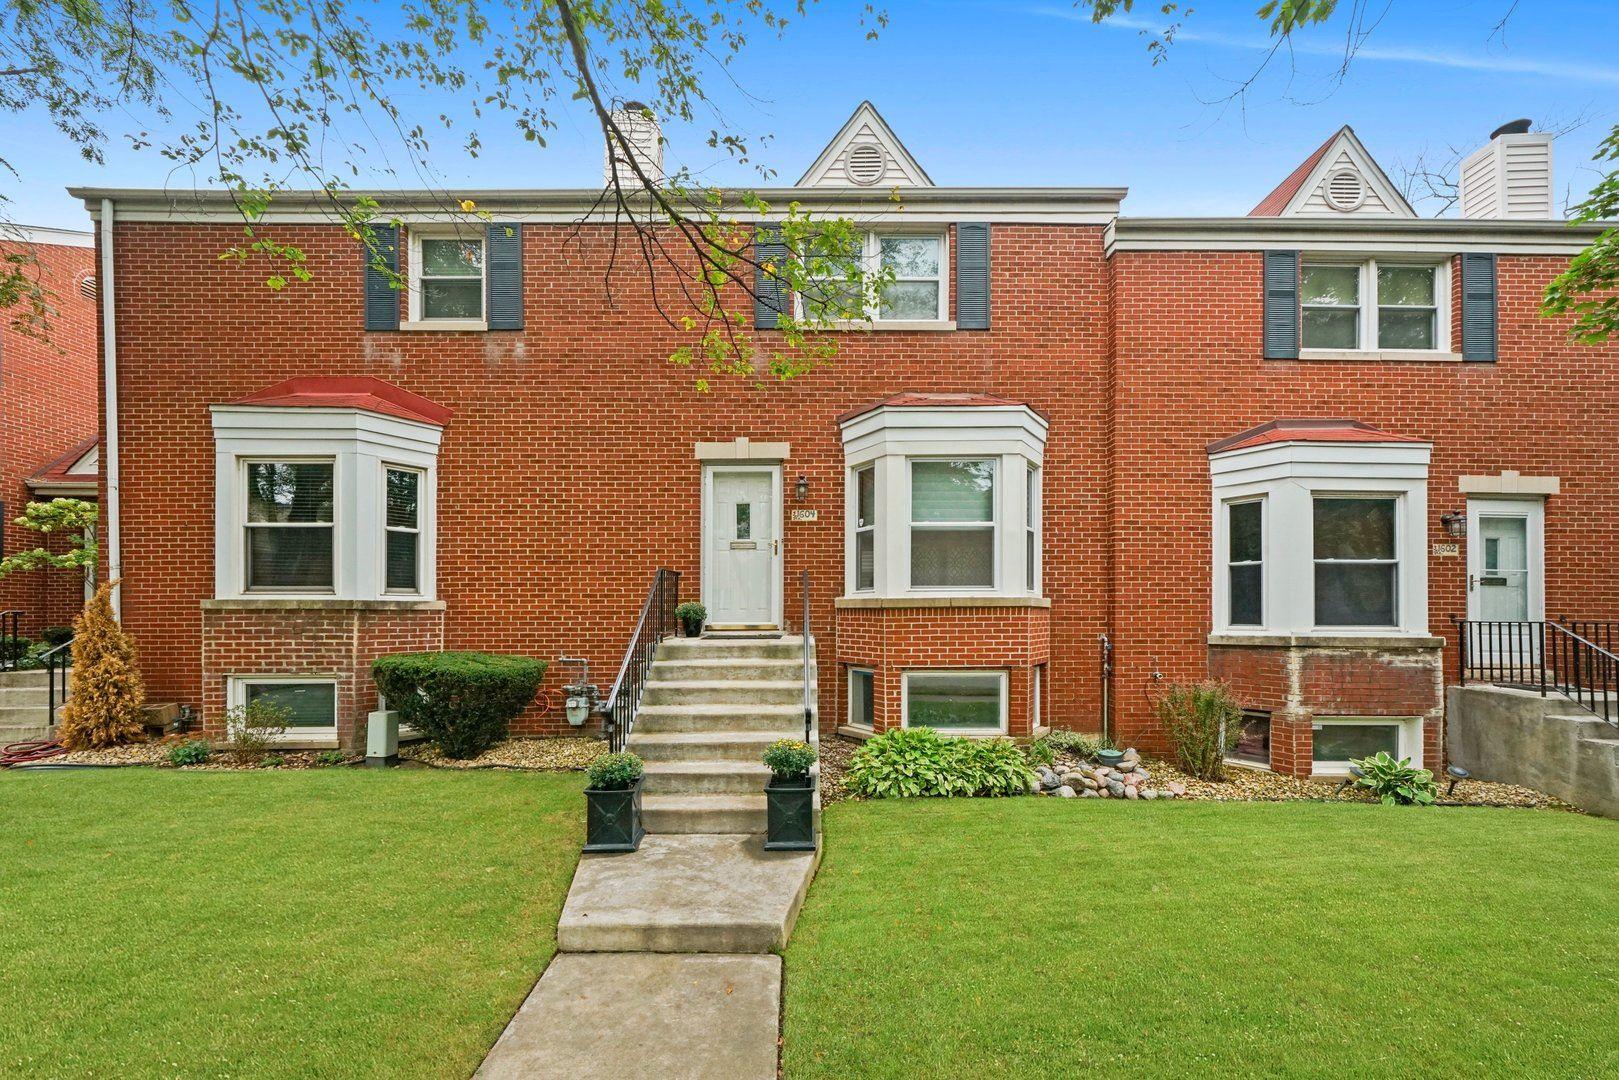 1604 W 103RD Street, Chicago, IL 60643 - MLS#: 11241097